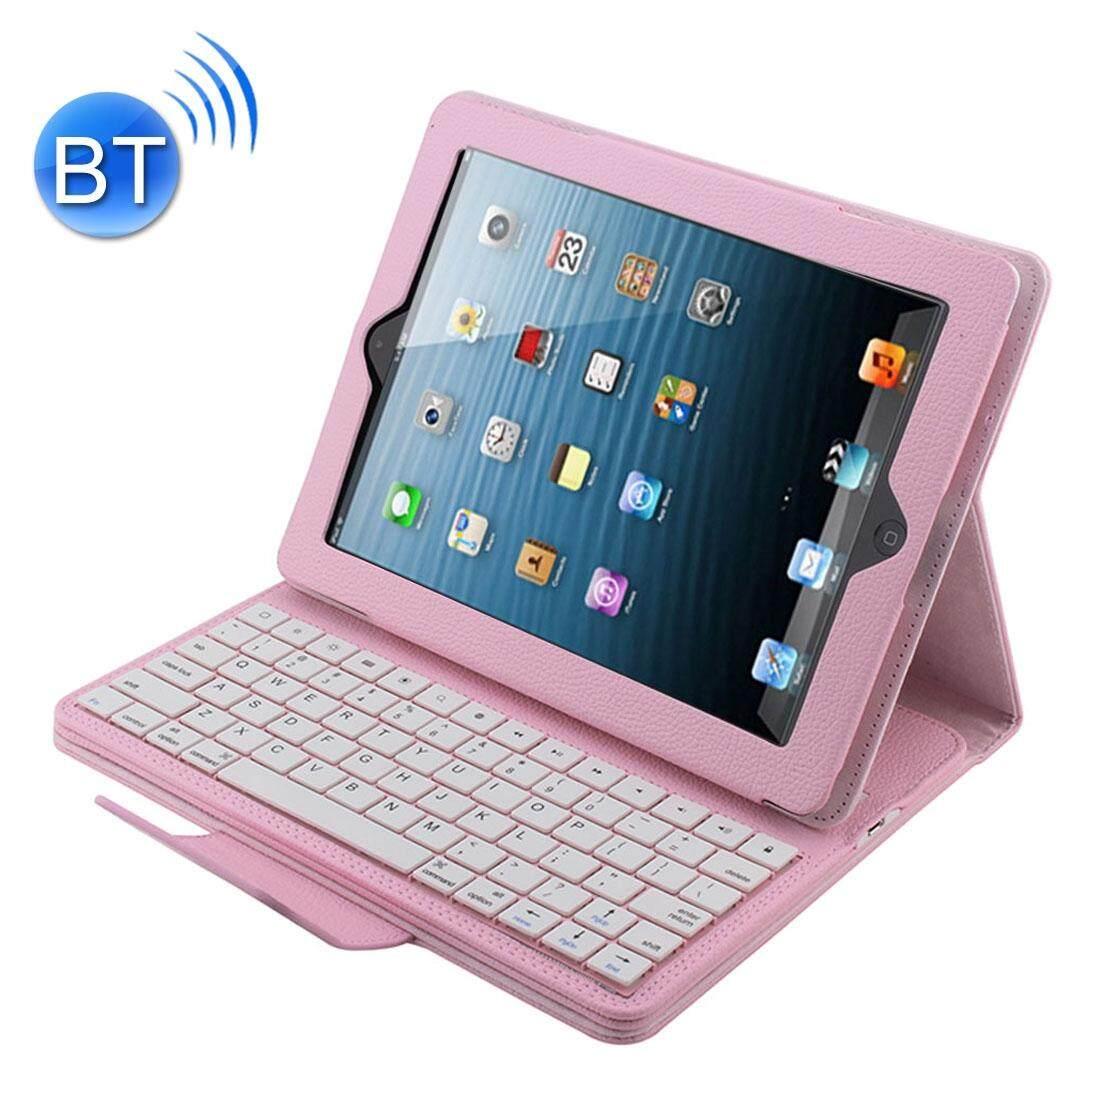 bdd01b15228 Buy Keyboards Gaming Online | Electronics | Lazada